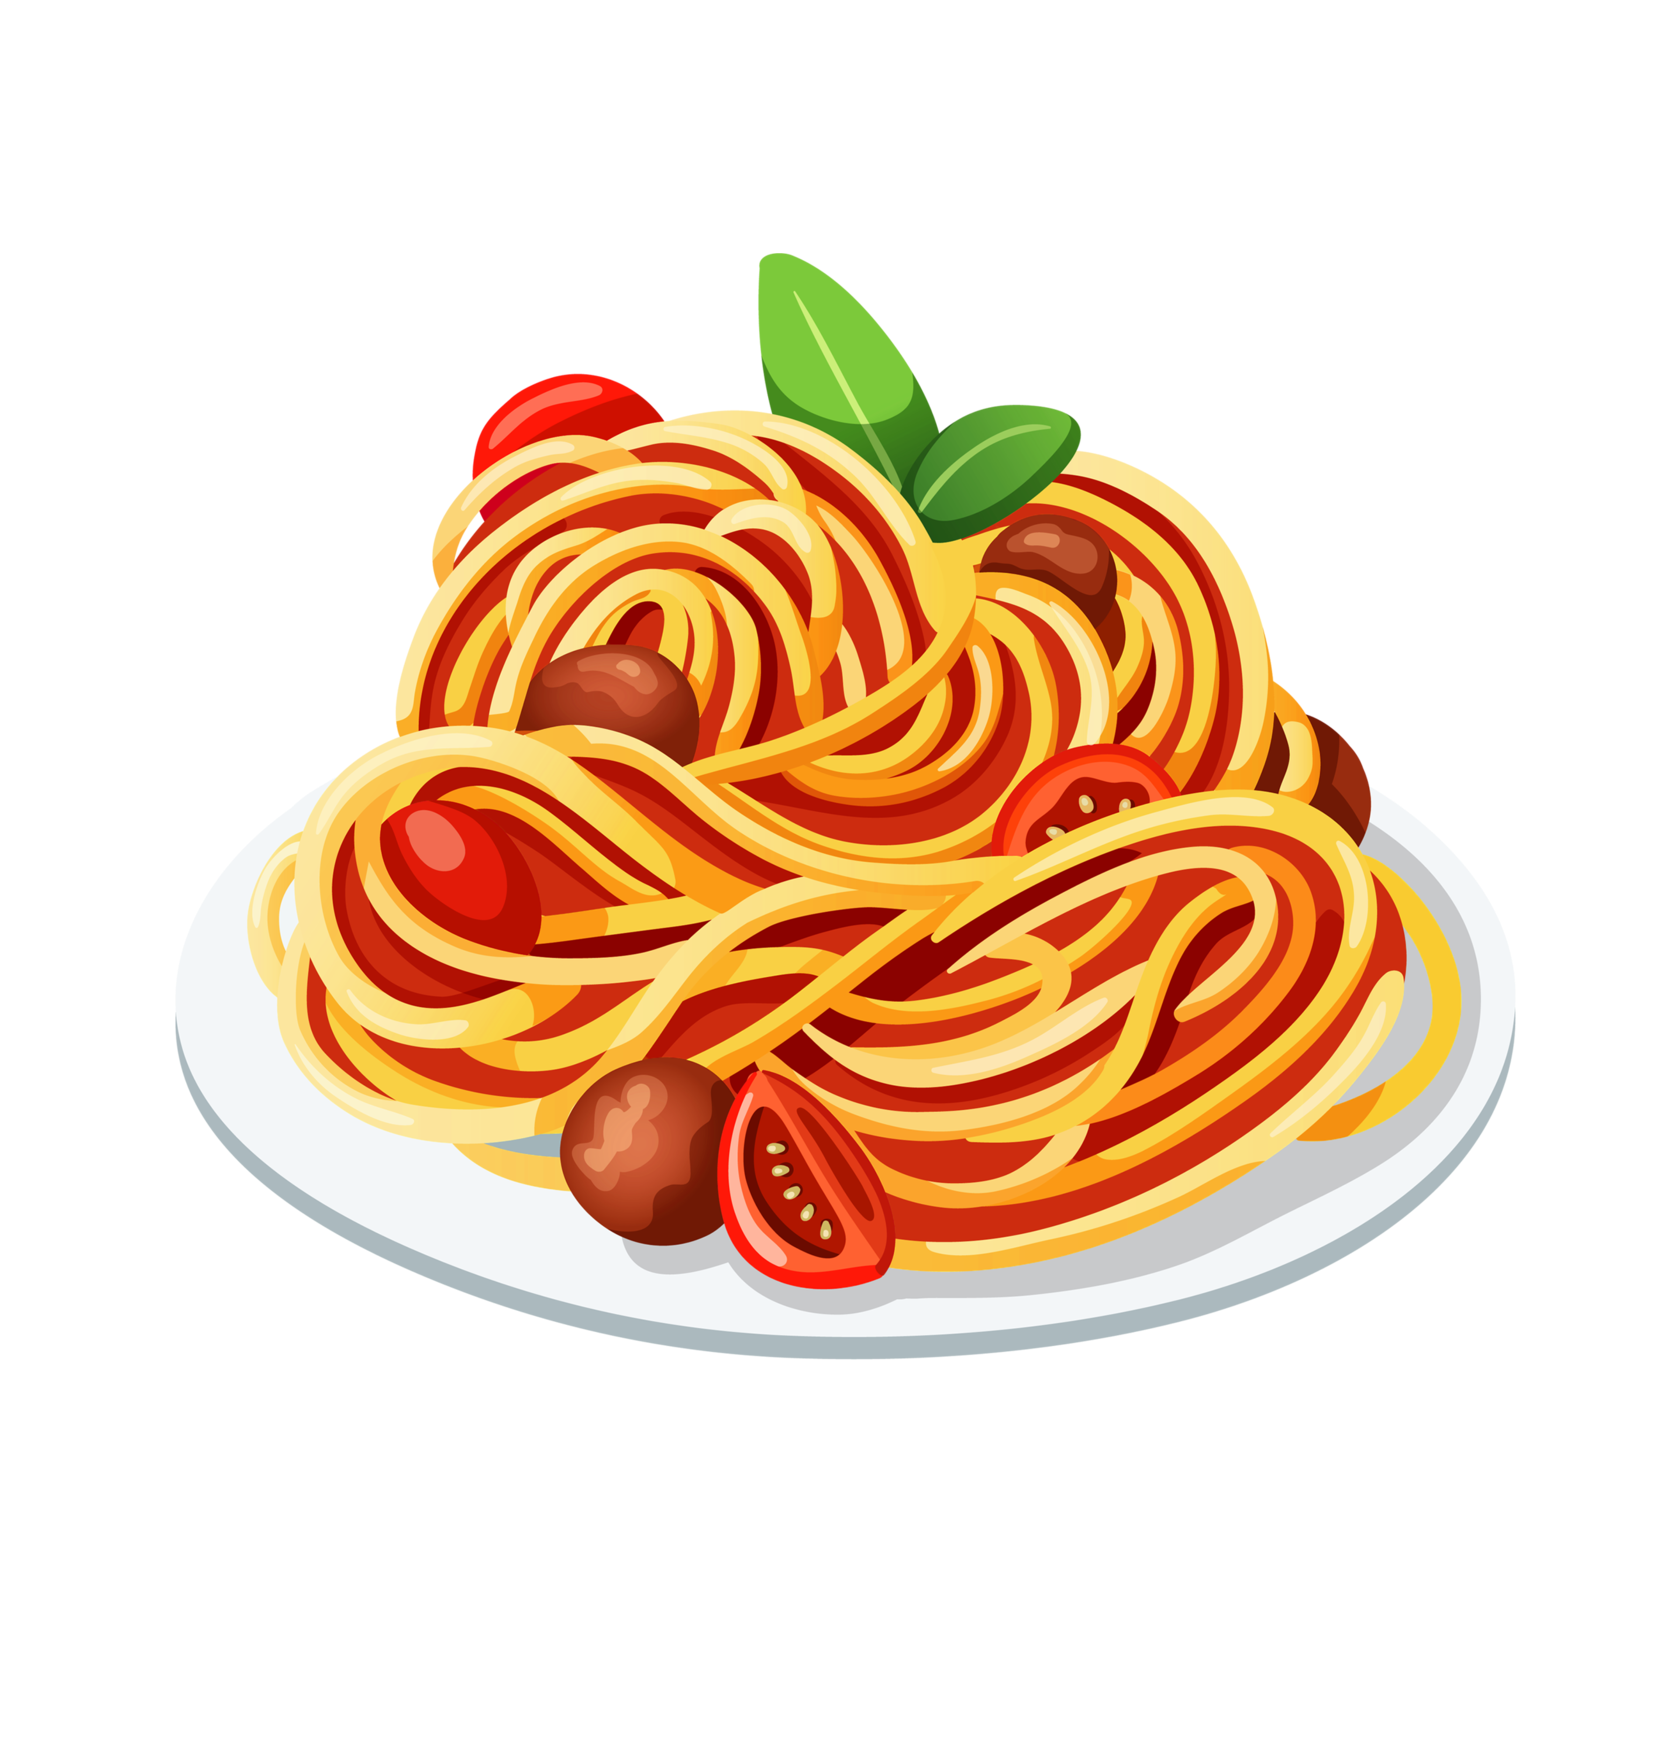 Italian clipart spaghetti italian. Pasta cuisine with meatballs